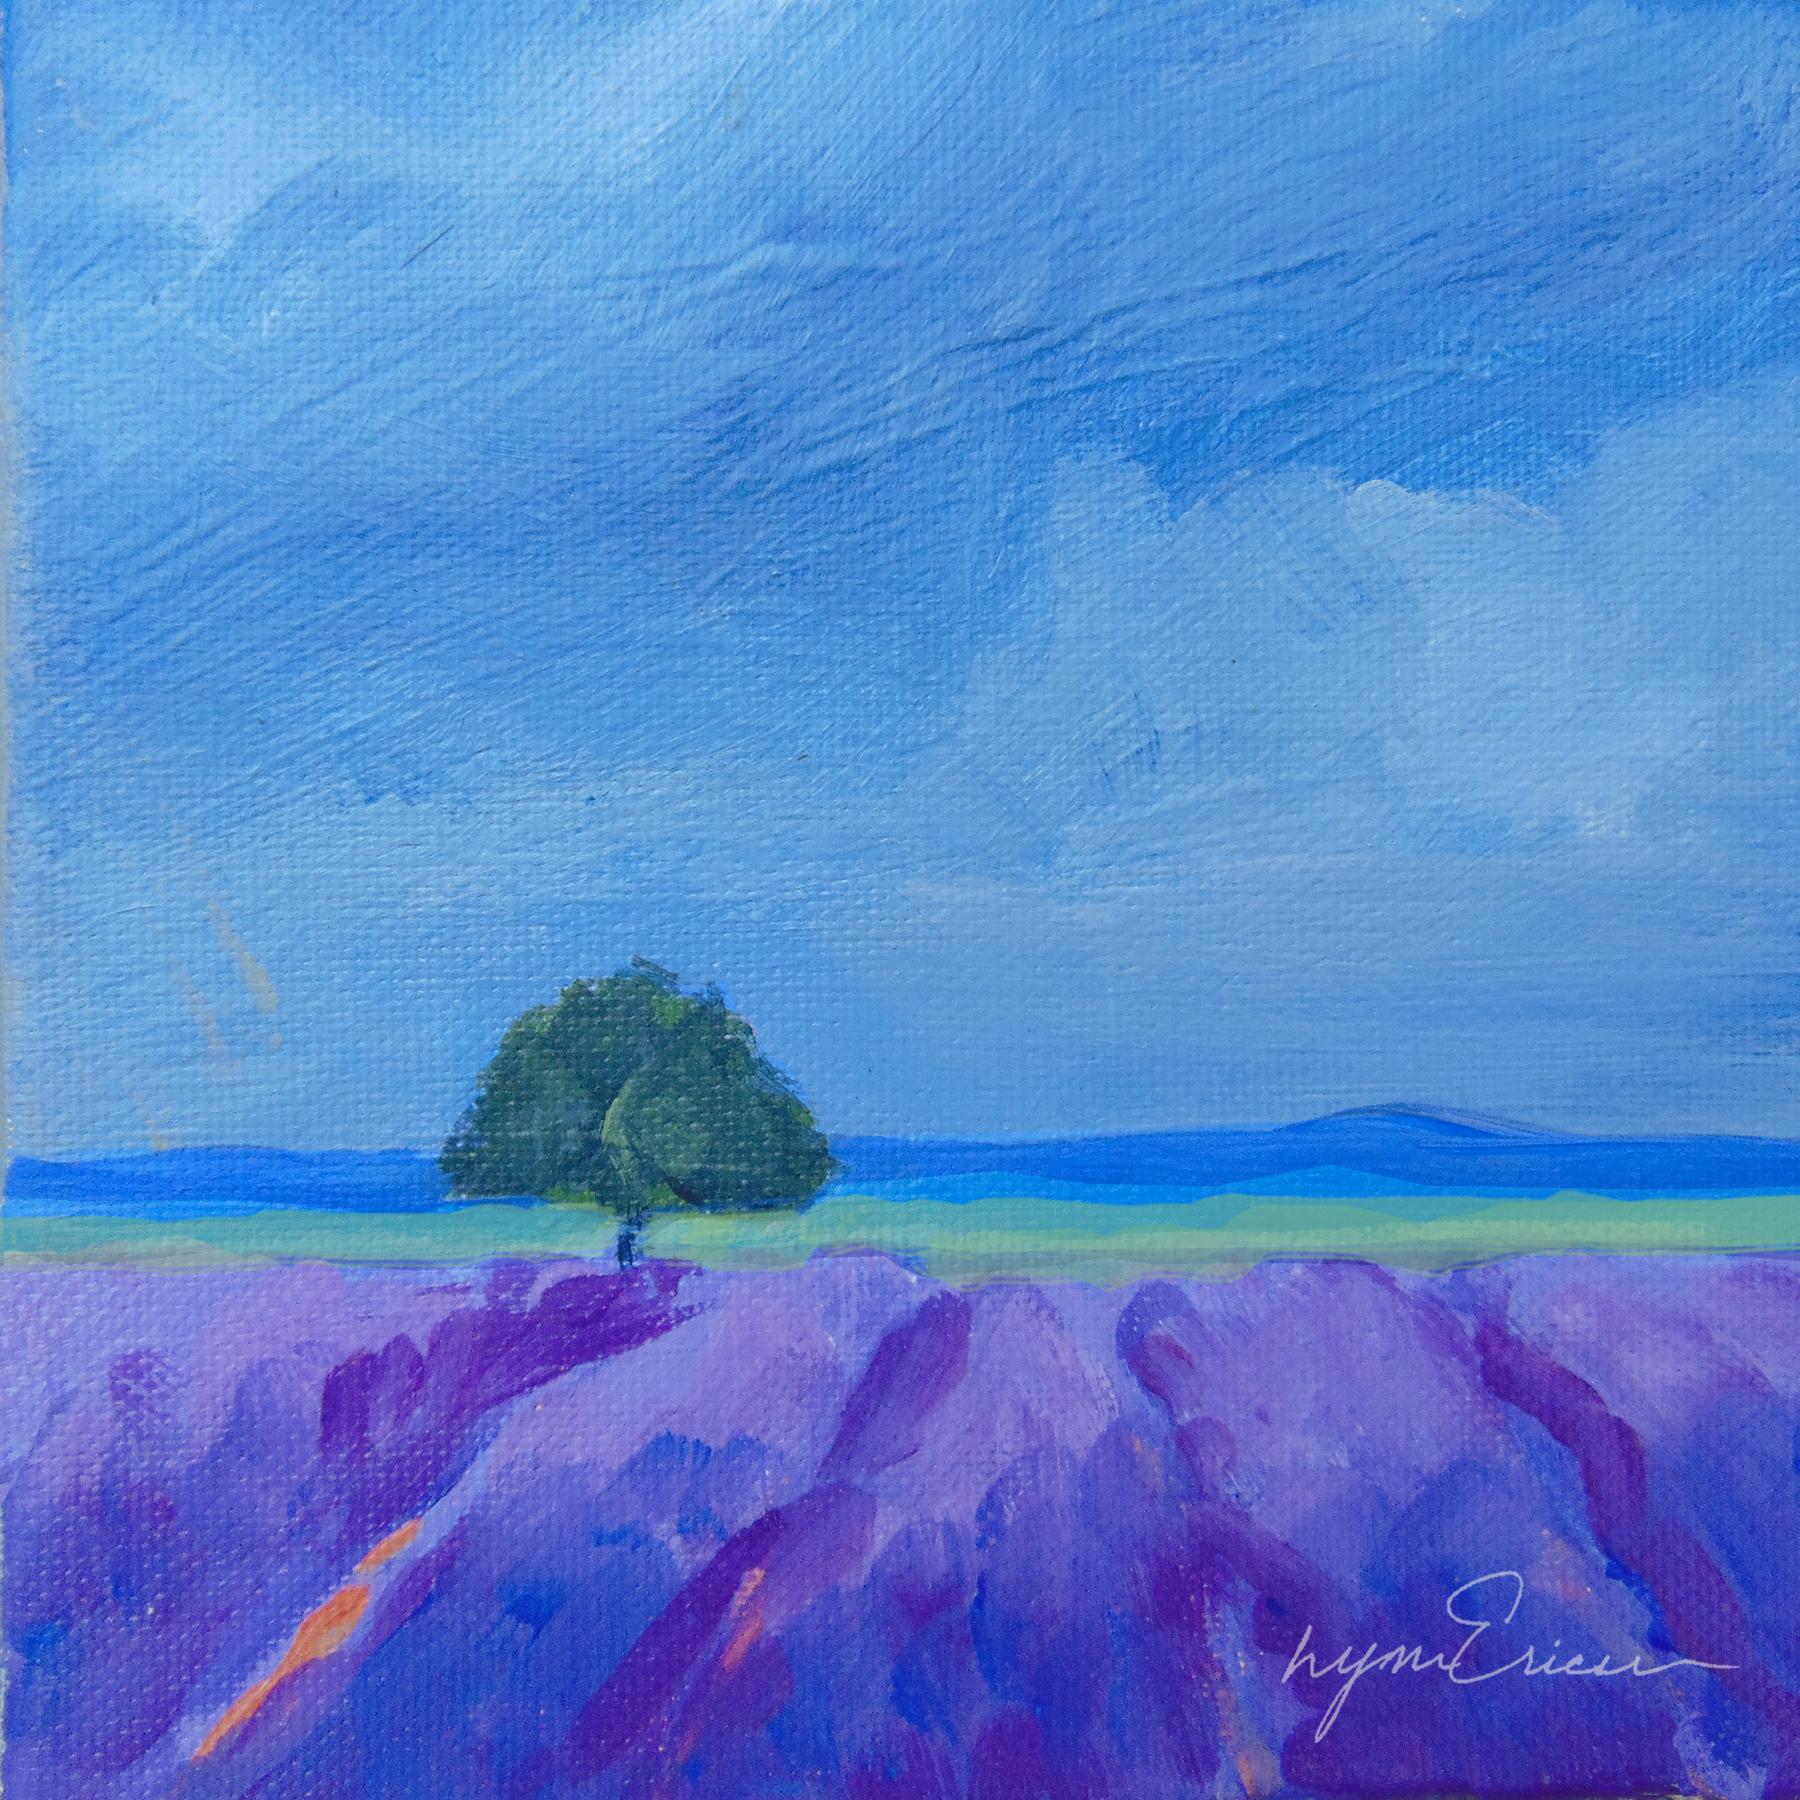 Cobalt and purple zmssdh